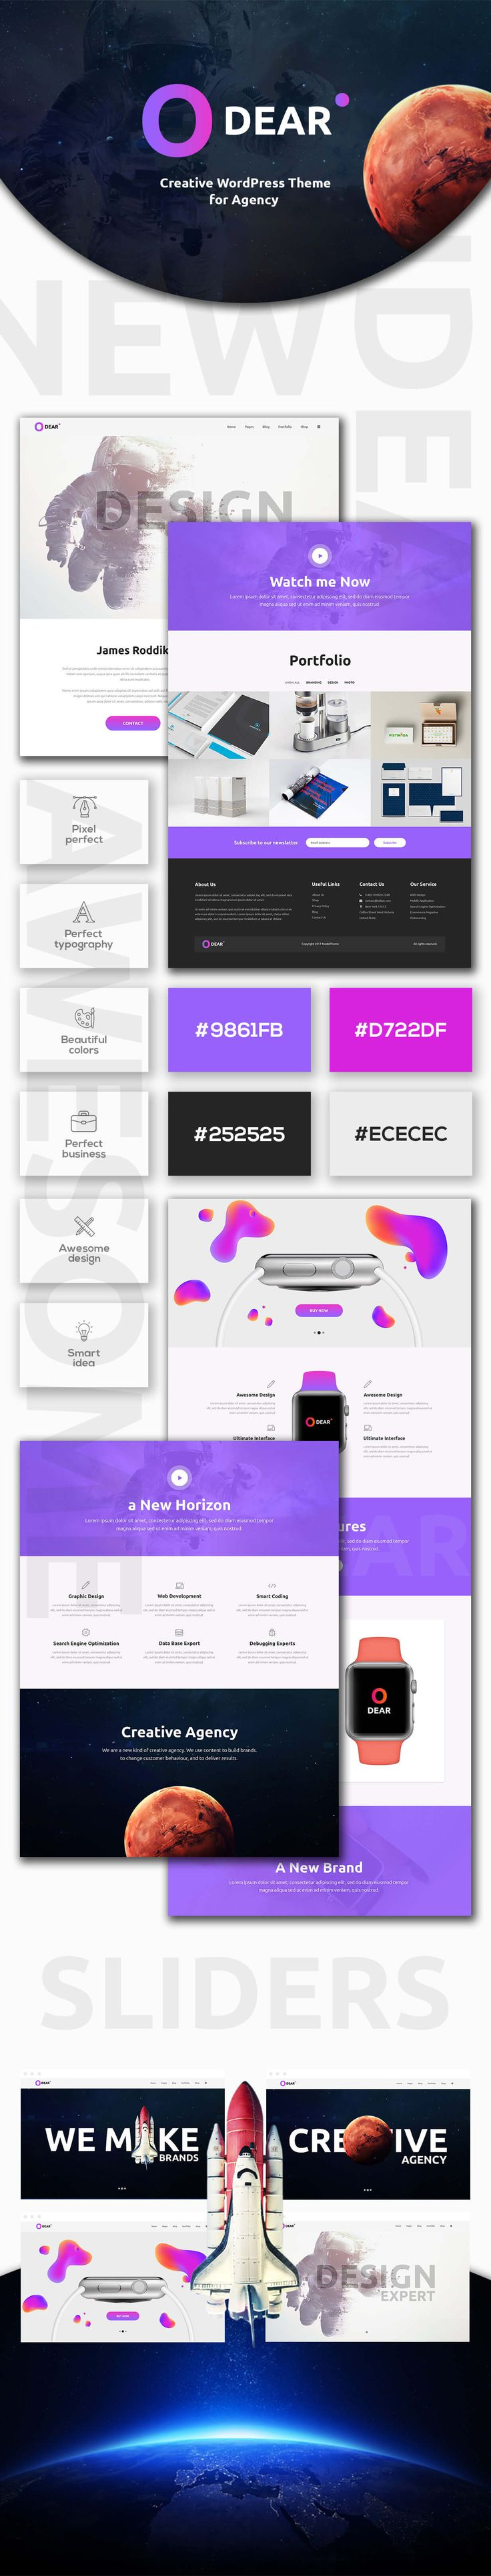 Odear - Multi-Concept Creative WordPress Theme by modeltheme | ThemeForest